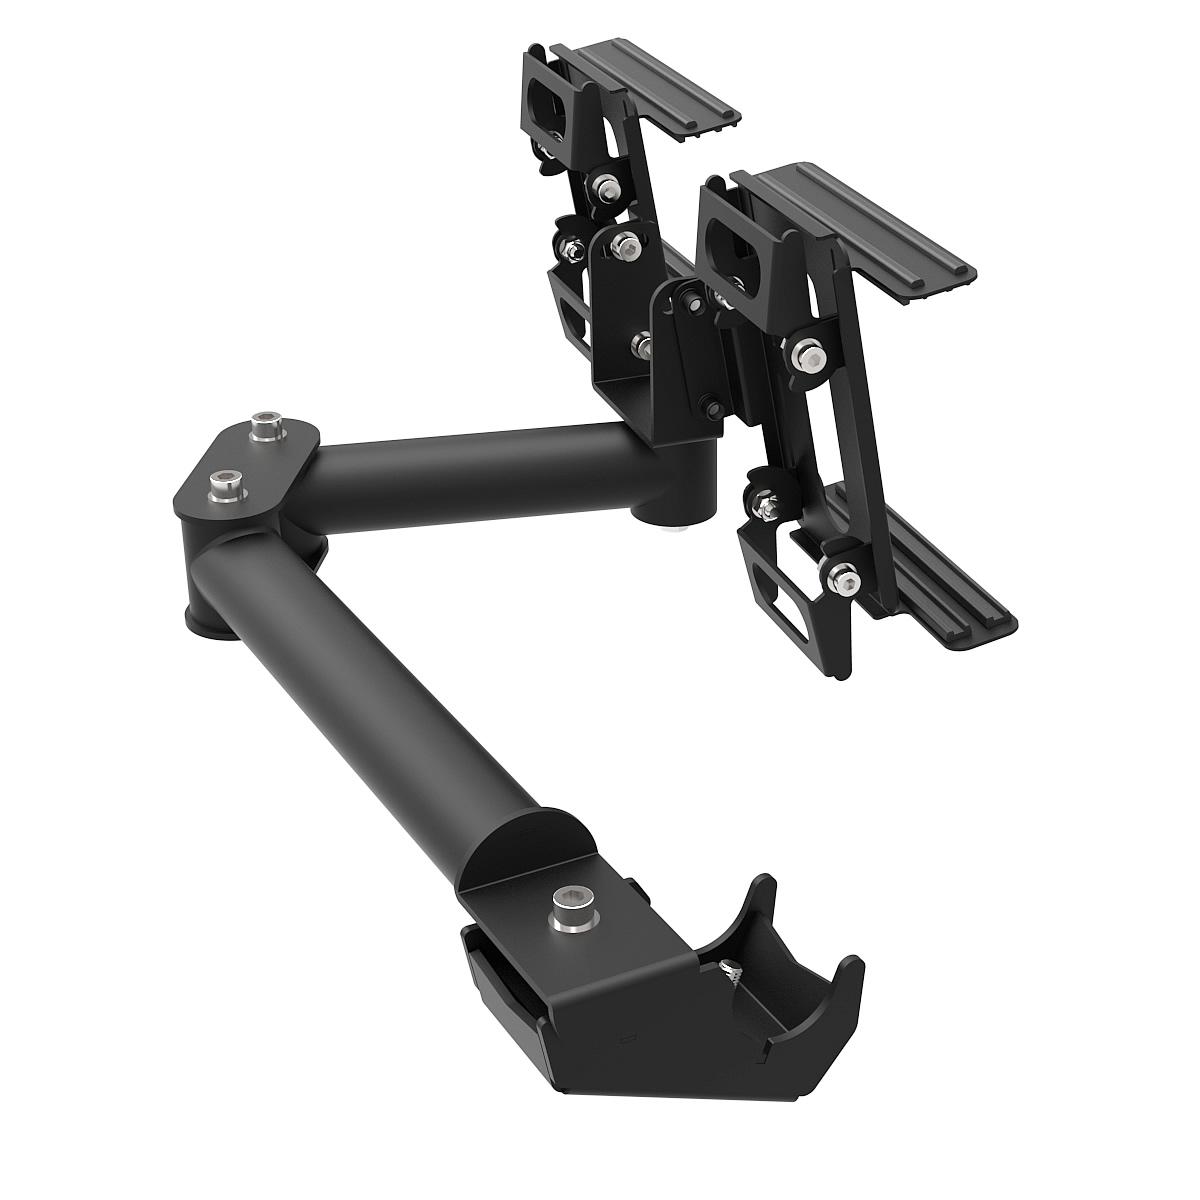 B1 / P1 / C1 Tablet / Buttonbox Upgrade kit Black